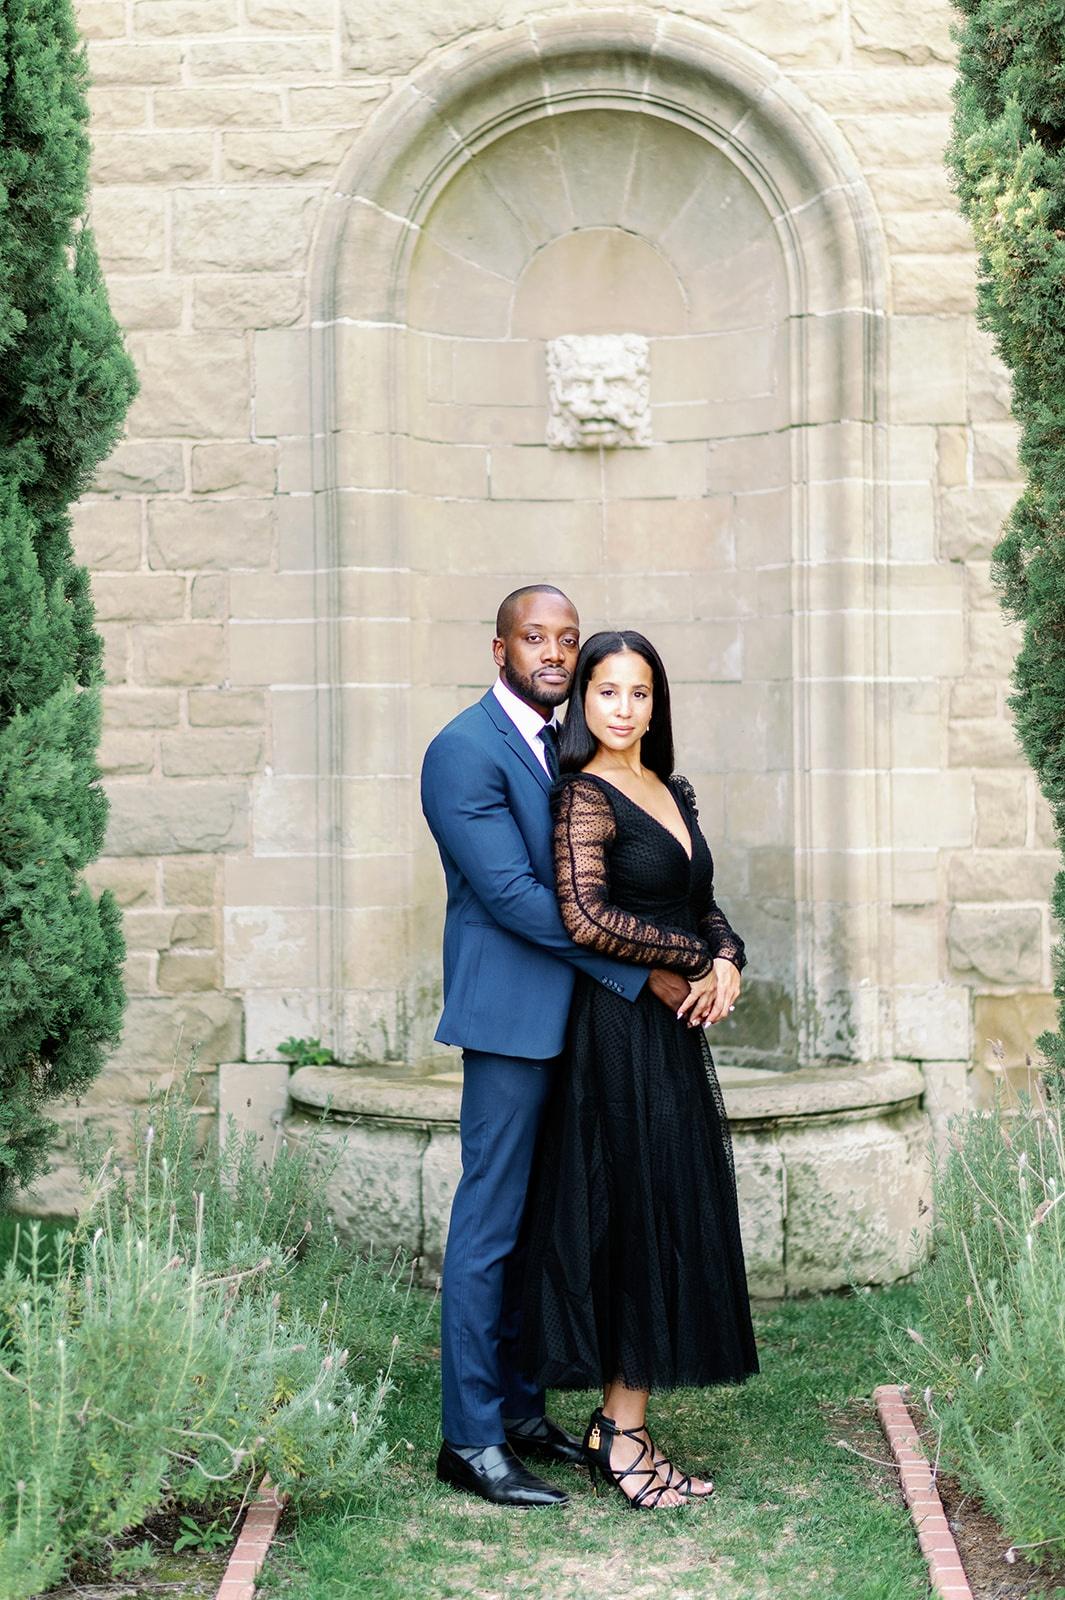 Greystone Mansion - Engagement Session